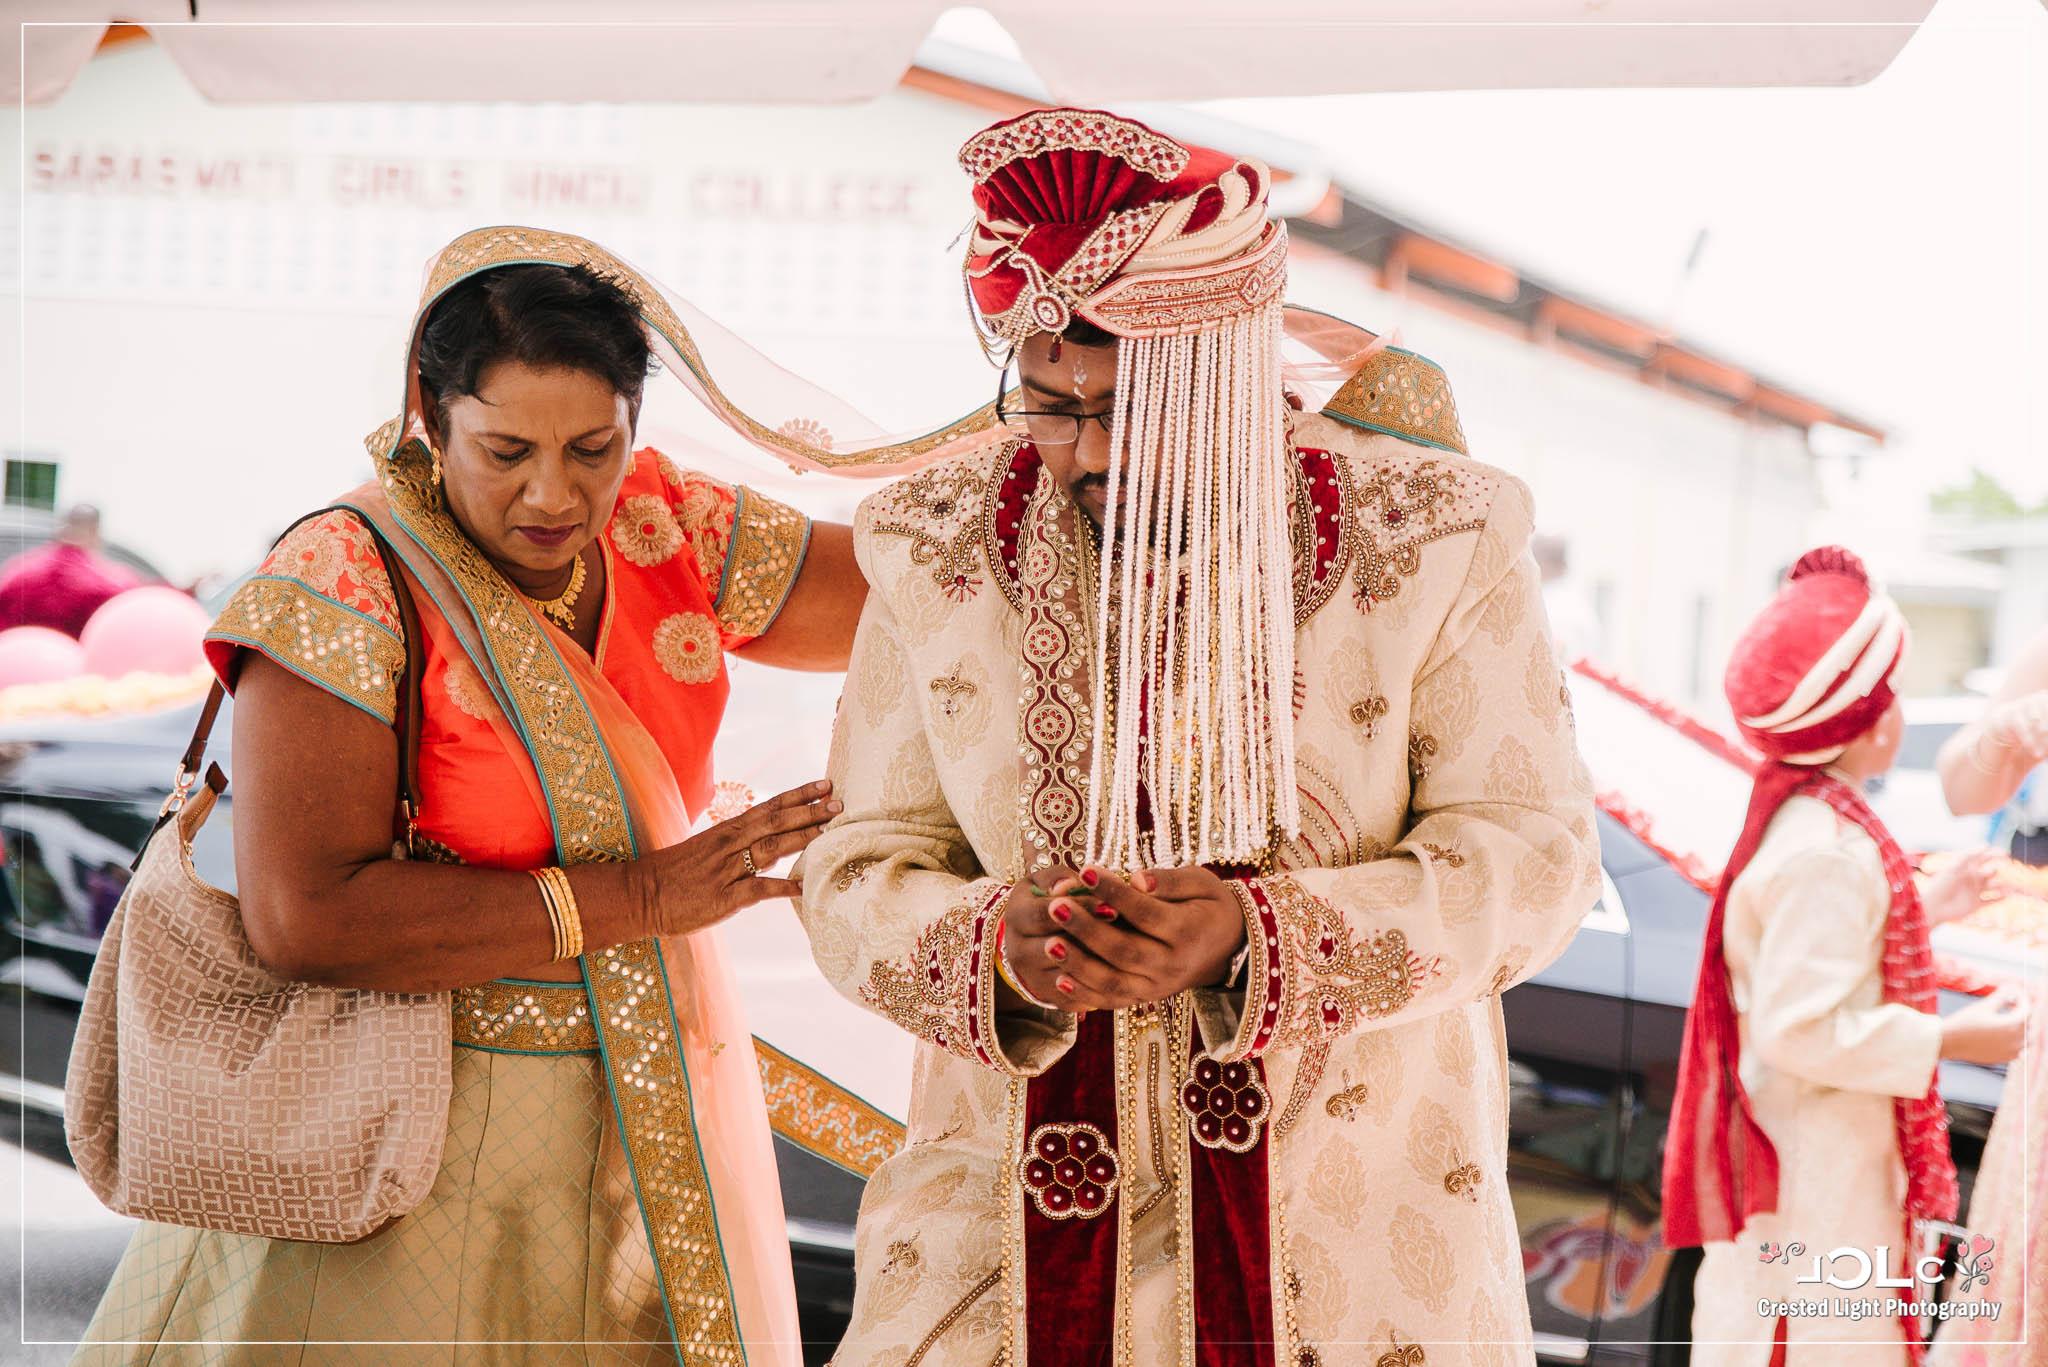 Devi mandir Trinidad Hindu wedding 09.jpg